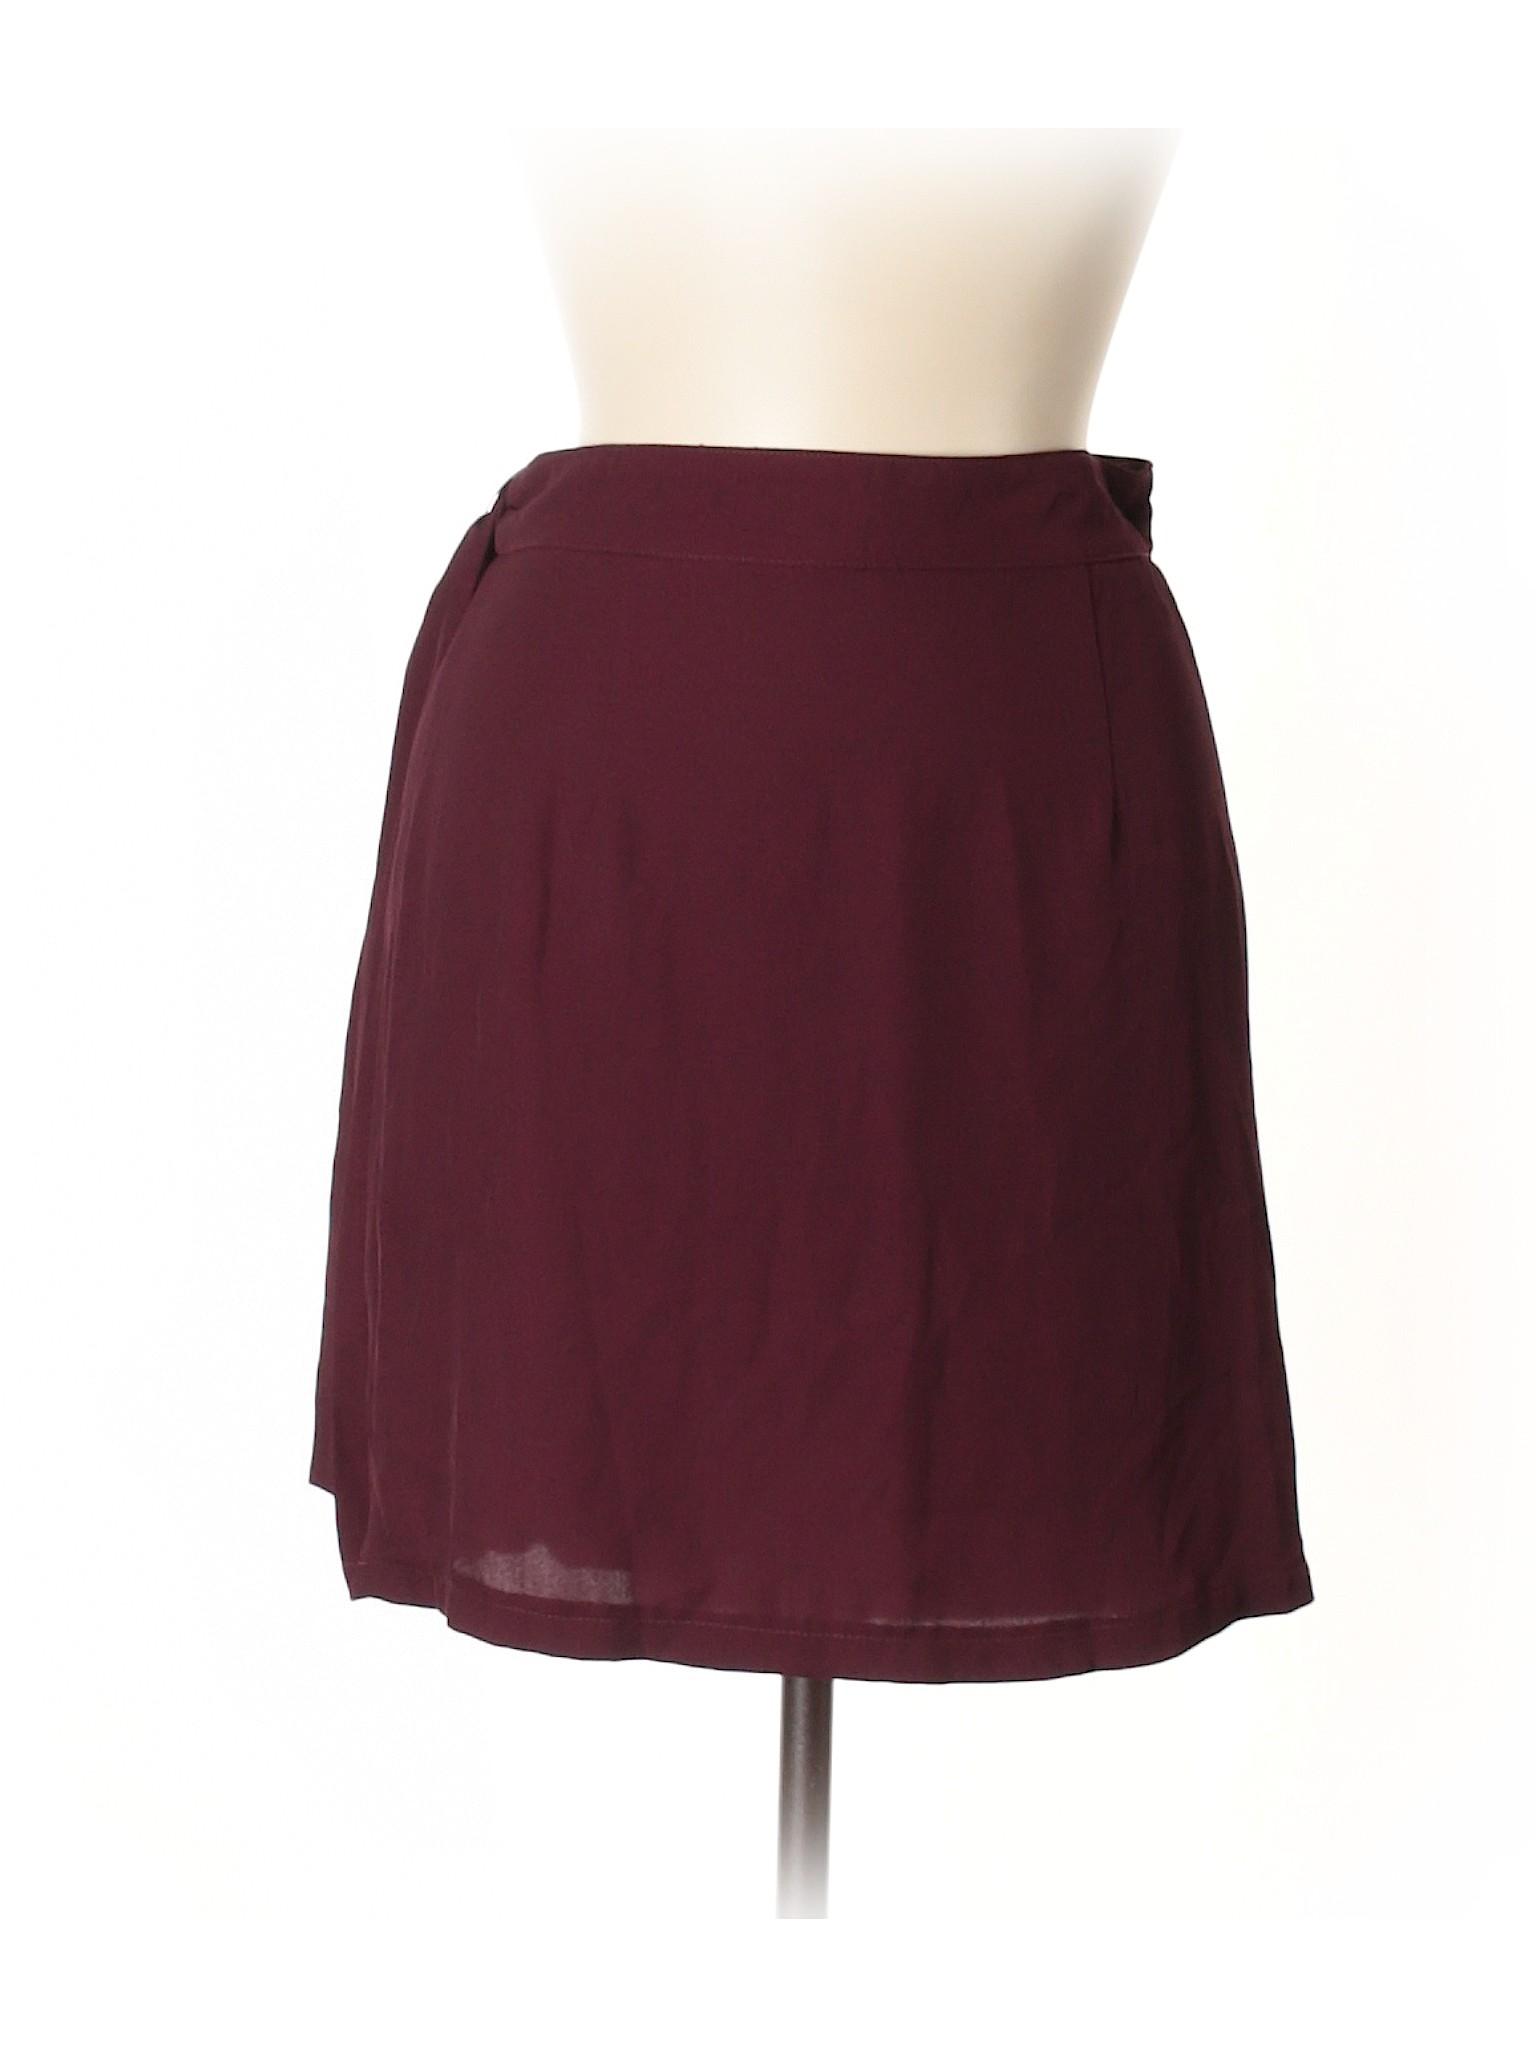 Casual Leisure Skirt winter Fashion Union wwHp7